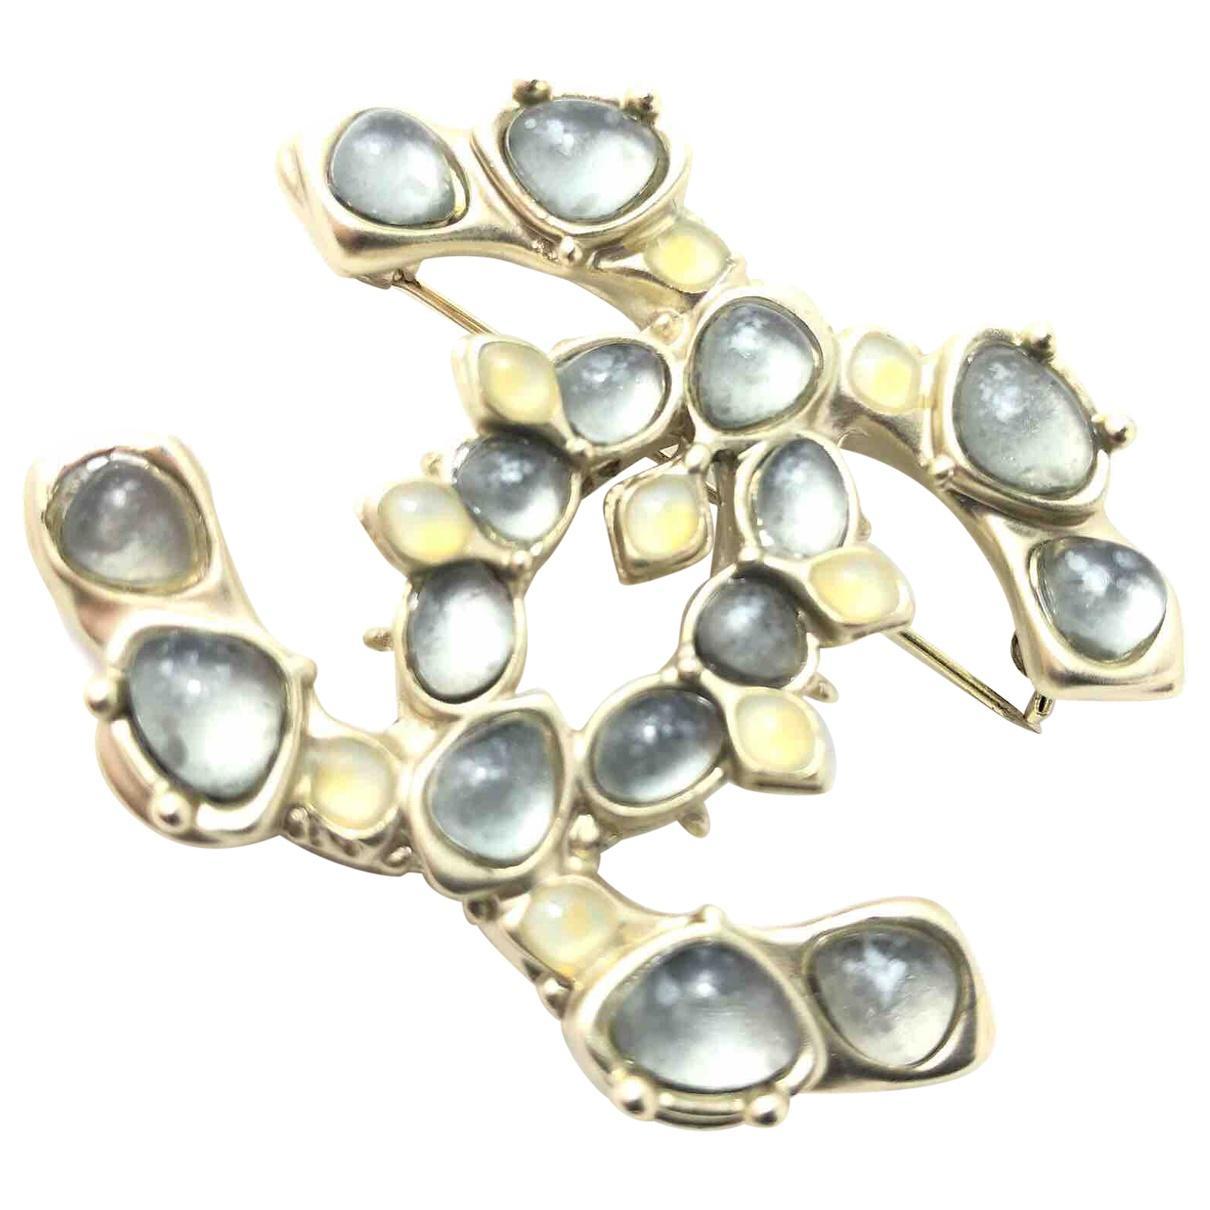 Lyst - Chanel Pin   Brooche in Metallic f69c08f4ff9